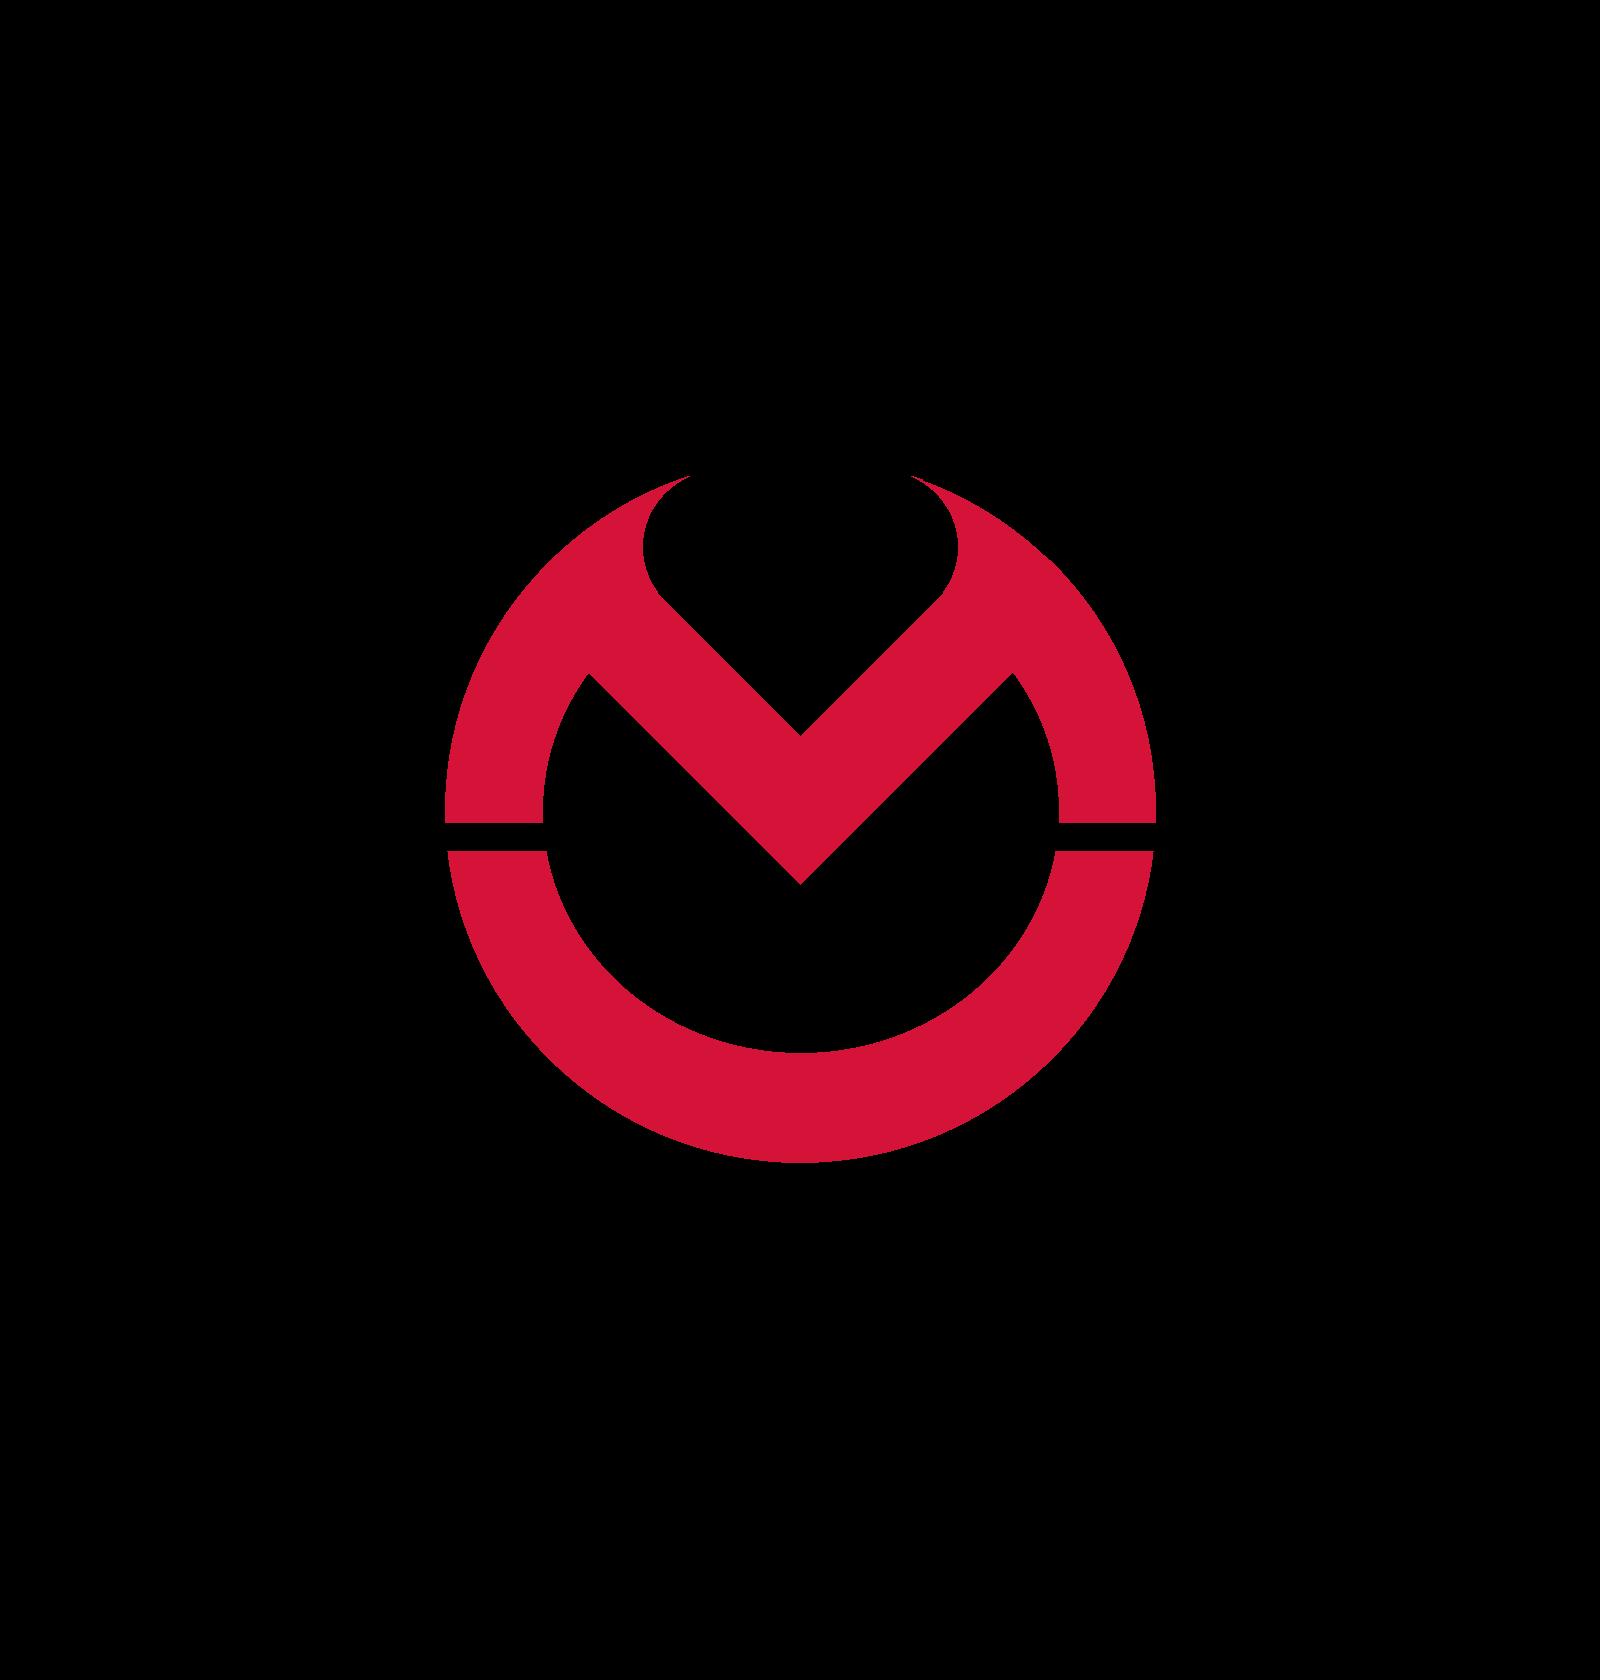 Manchester United Alternate Logo